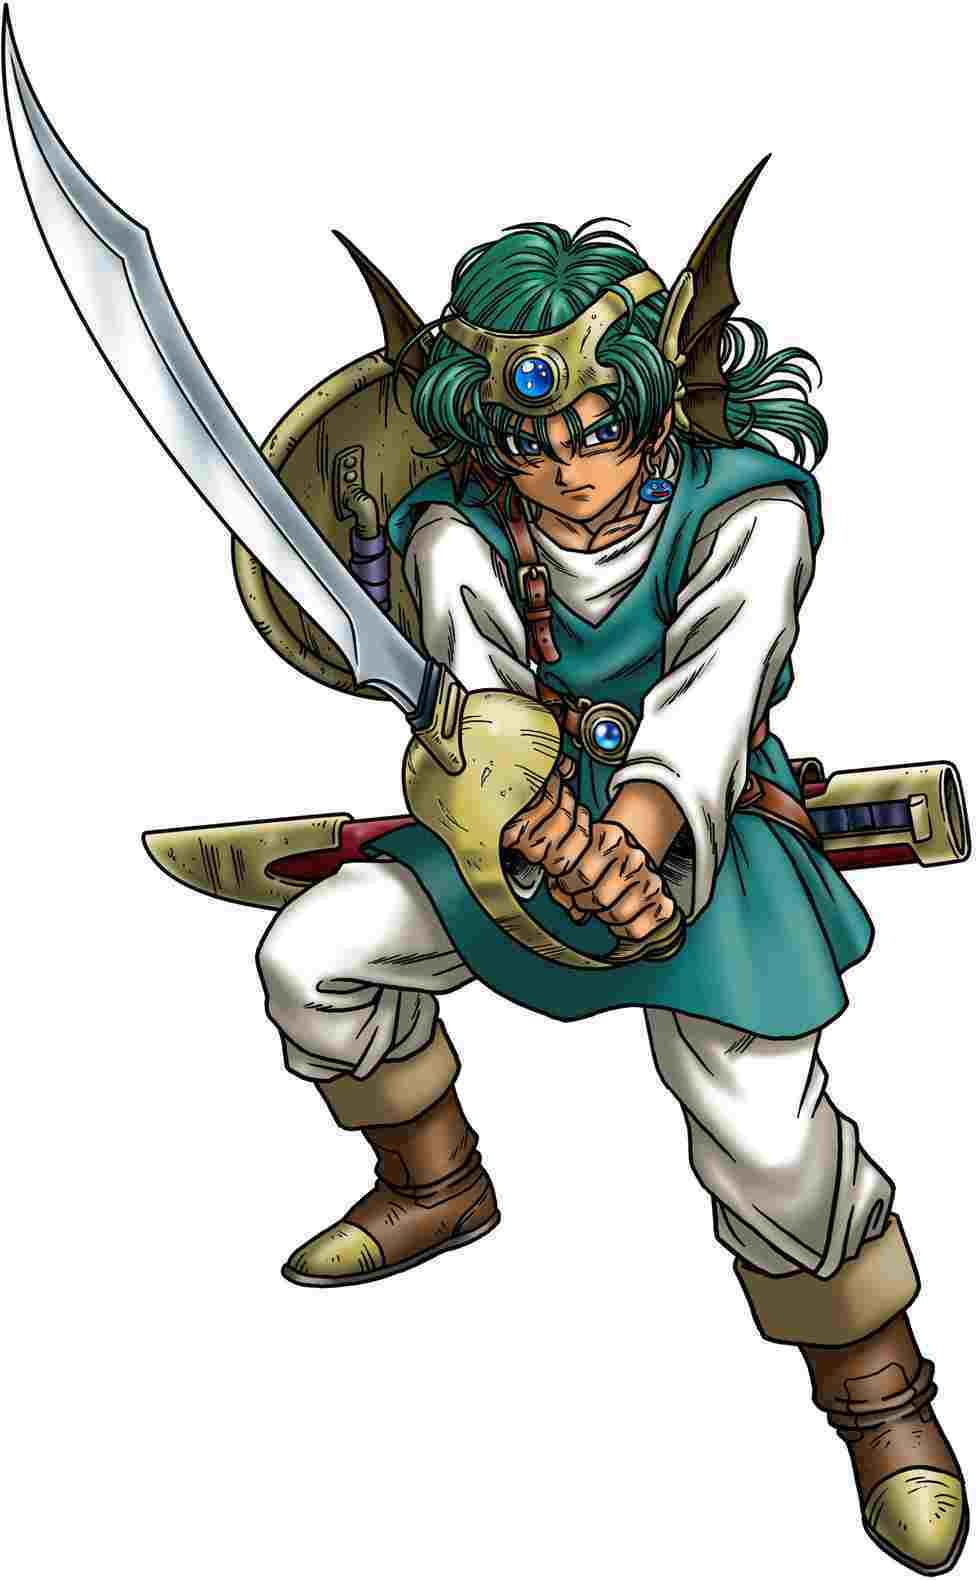 dragon quest images hero in dragon quest iv hd wallpaper